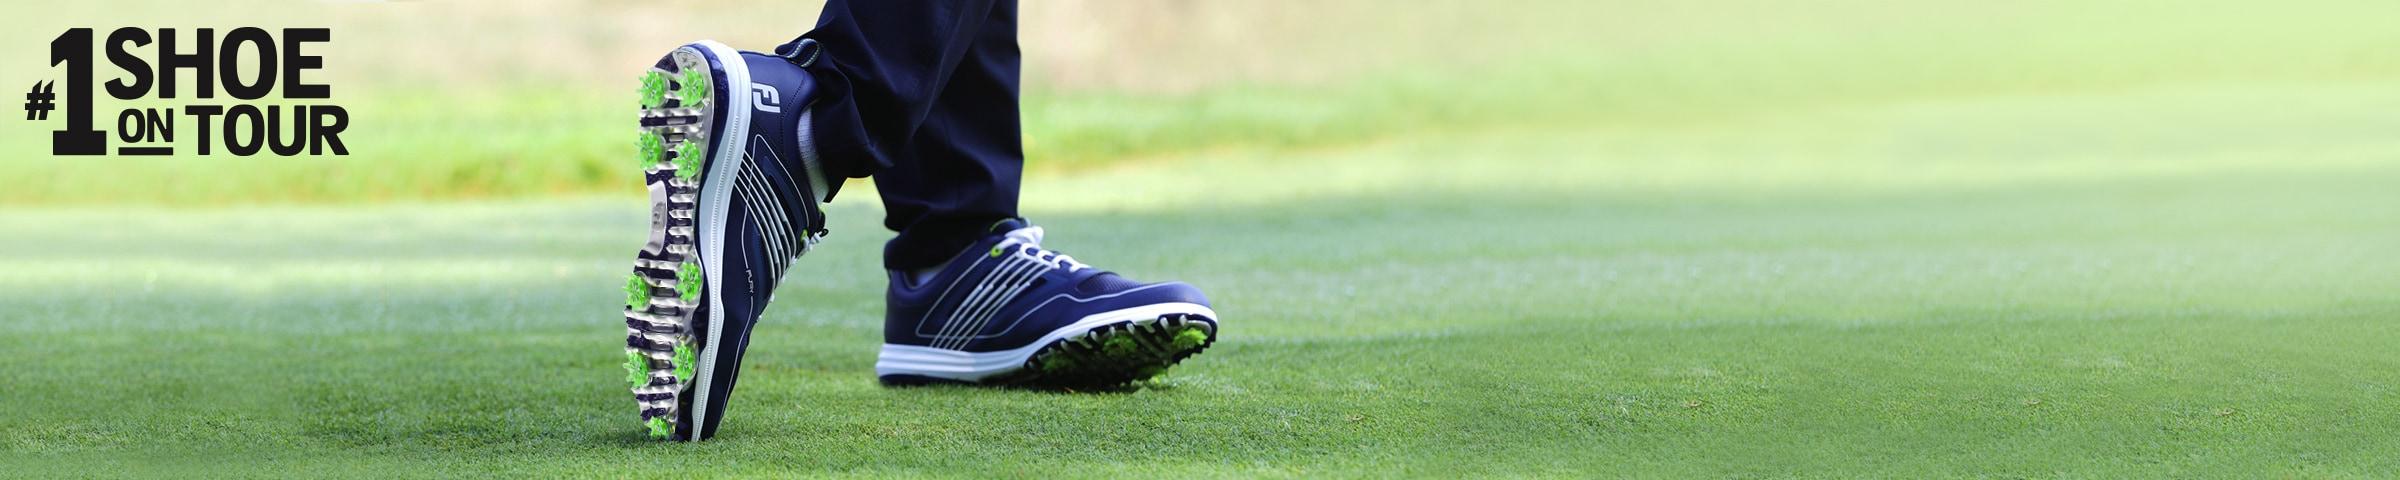 FootJoy 2019 Men's Golf Shoes